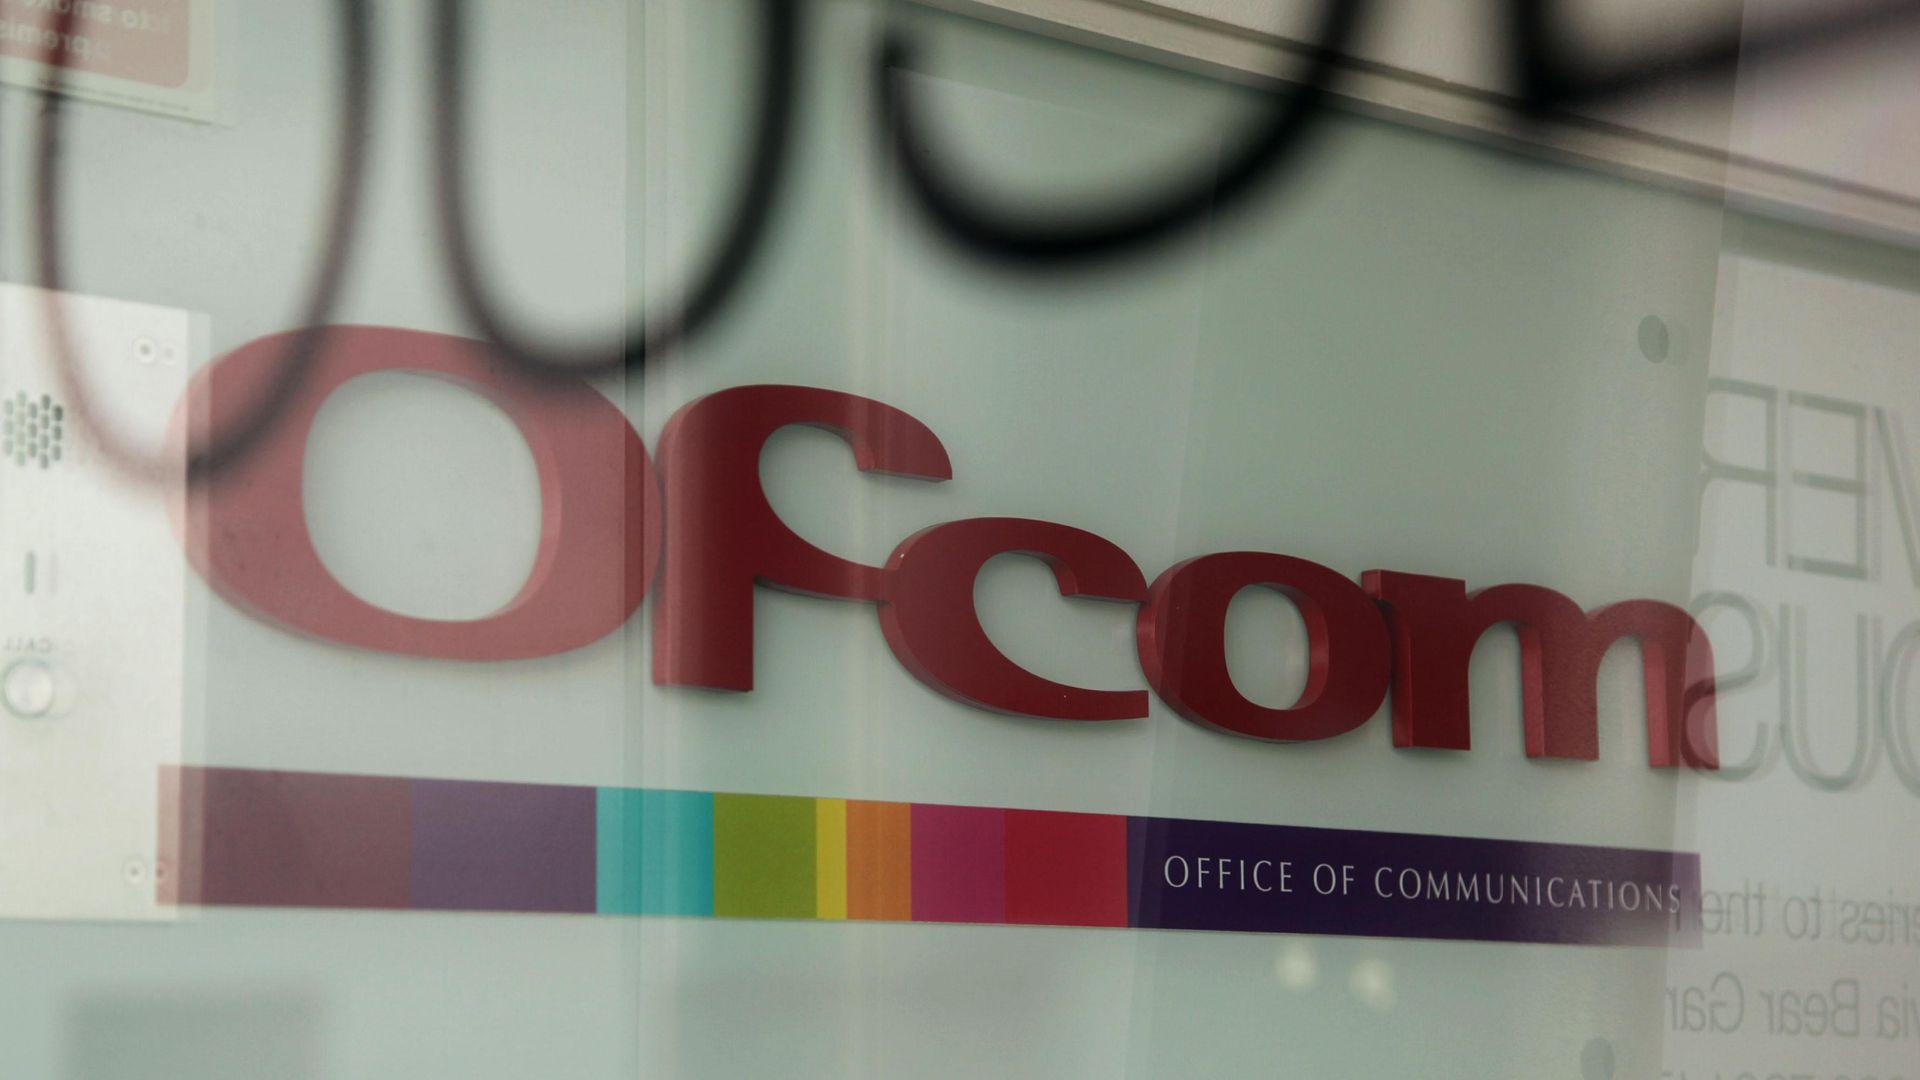 U.K. wireless regulator relies on Yahoo Groups to port phone numbers